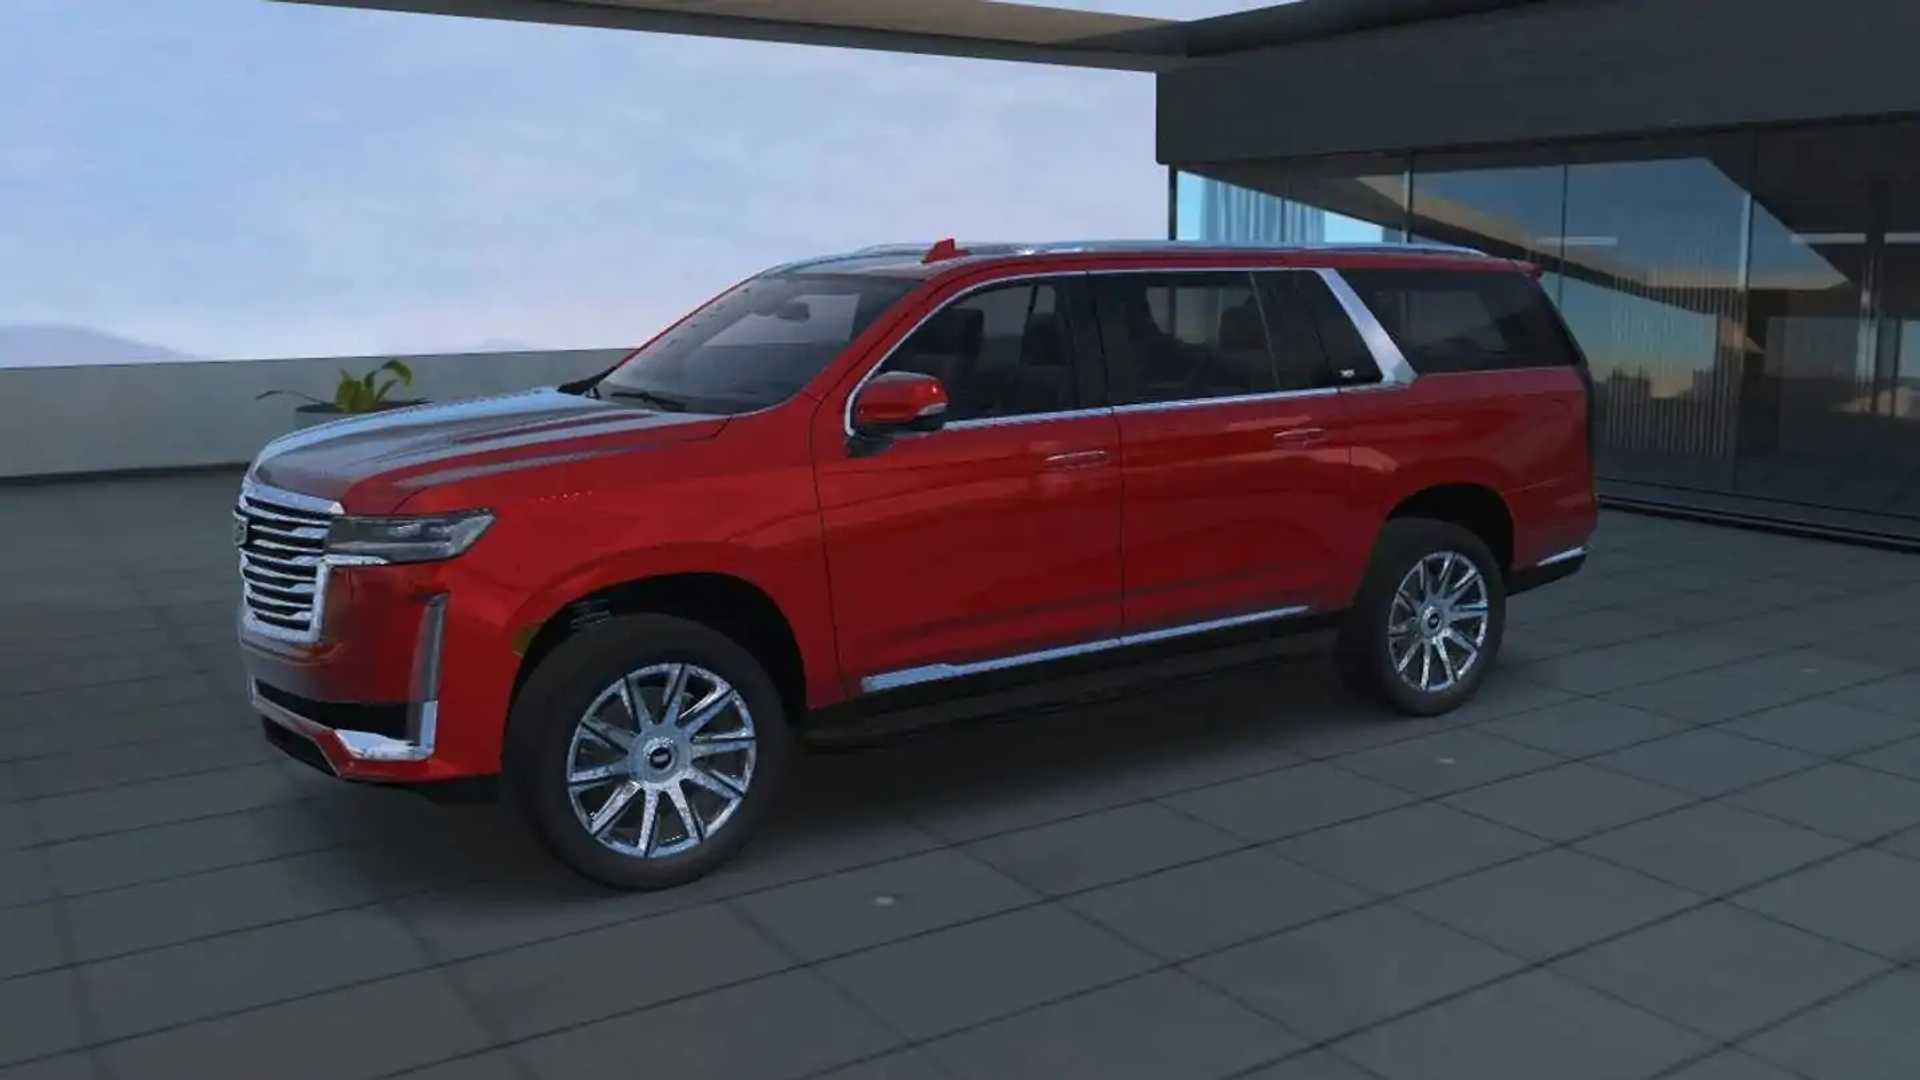 2021 cadillac escalade esv revealed ahead of new york auto